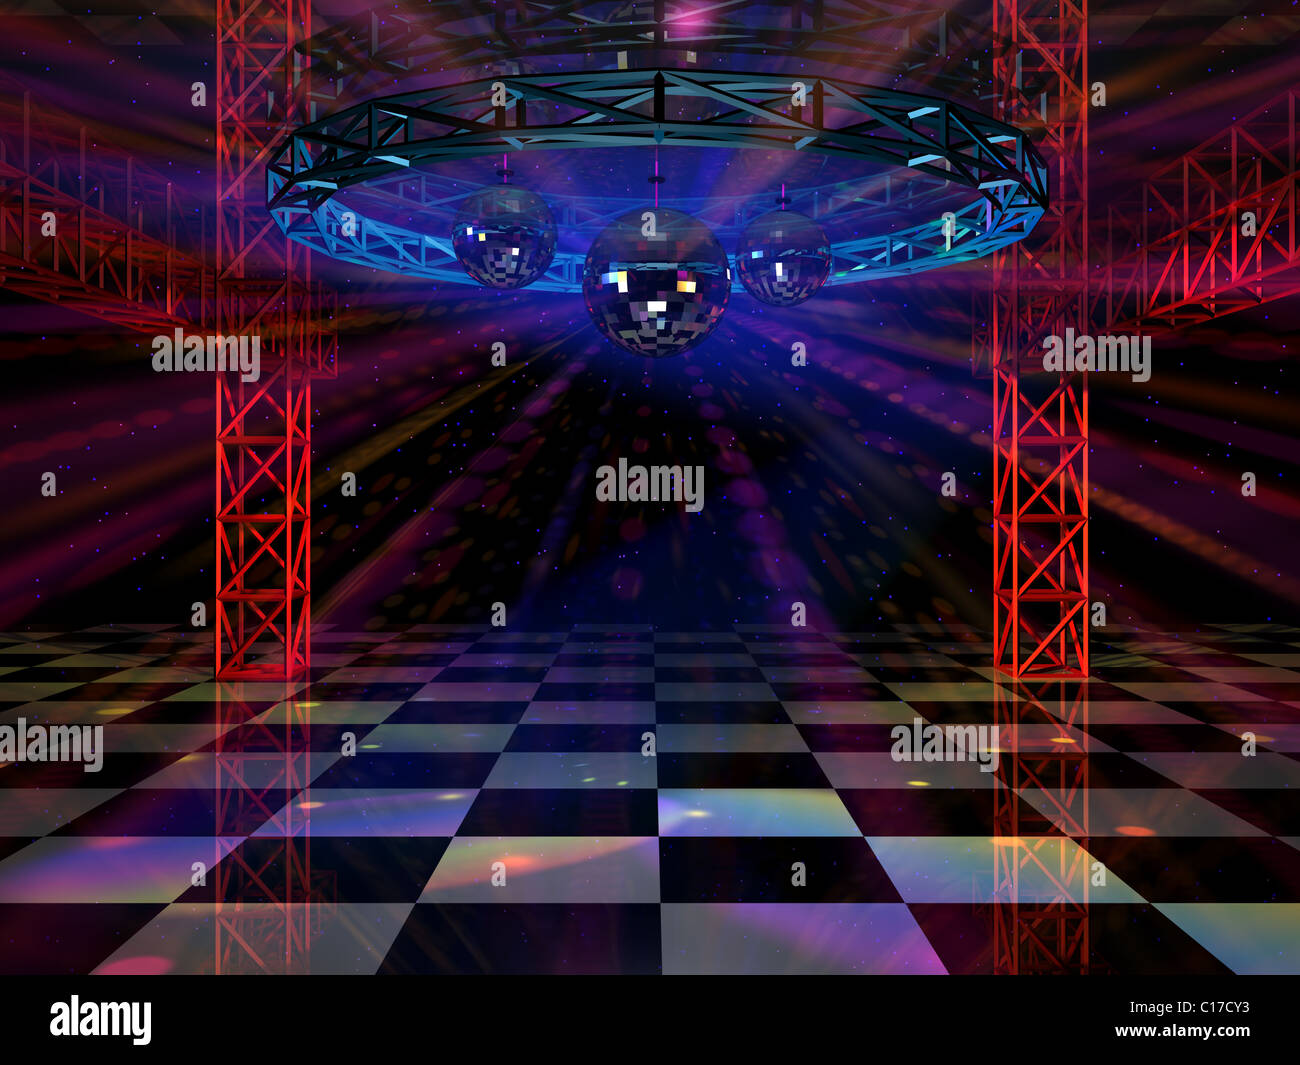 Stage Truss Red Light Stockfotos & Stage Truss Red Light Bilder - Alamy